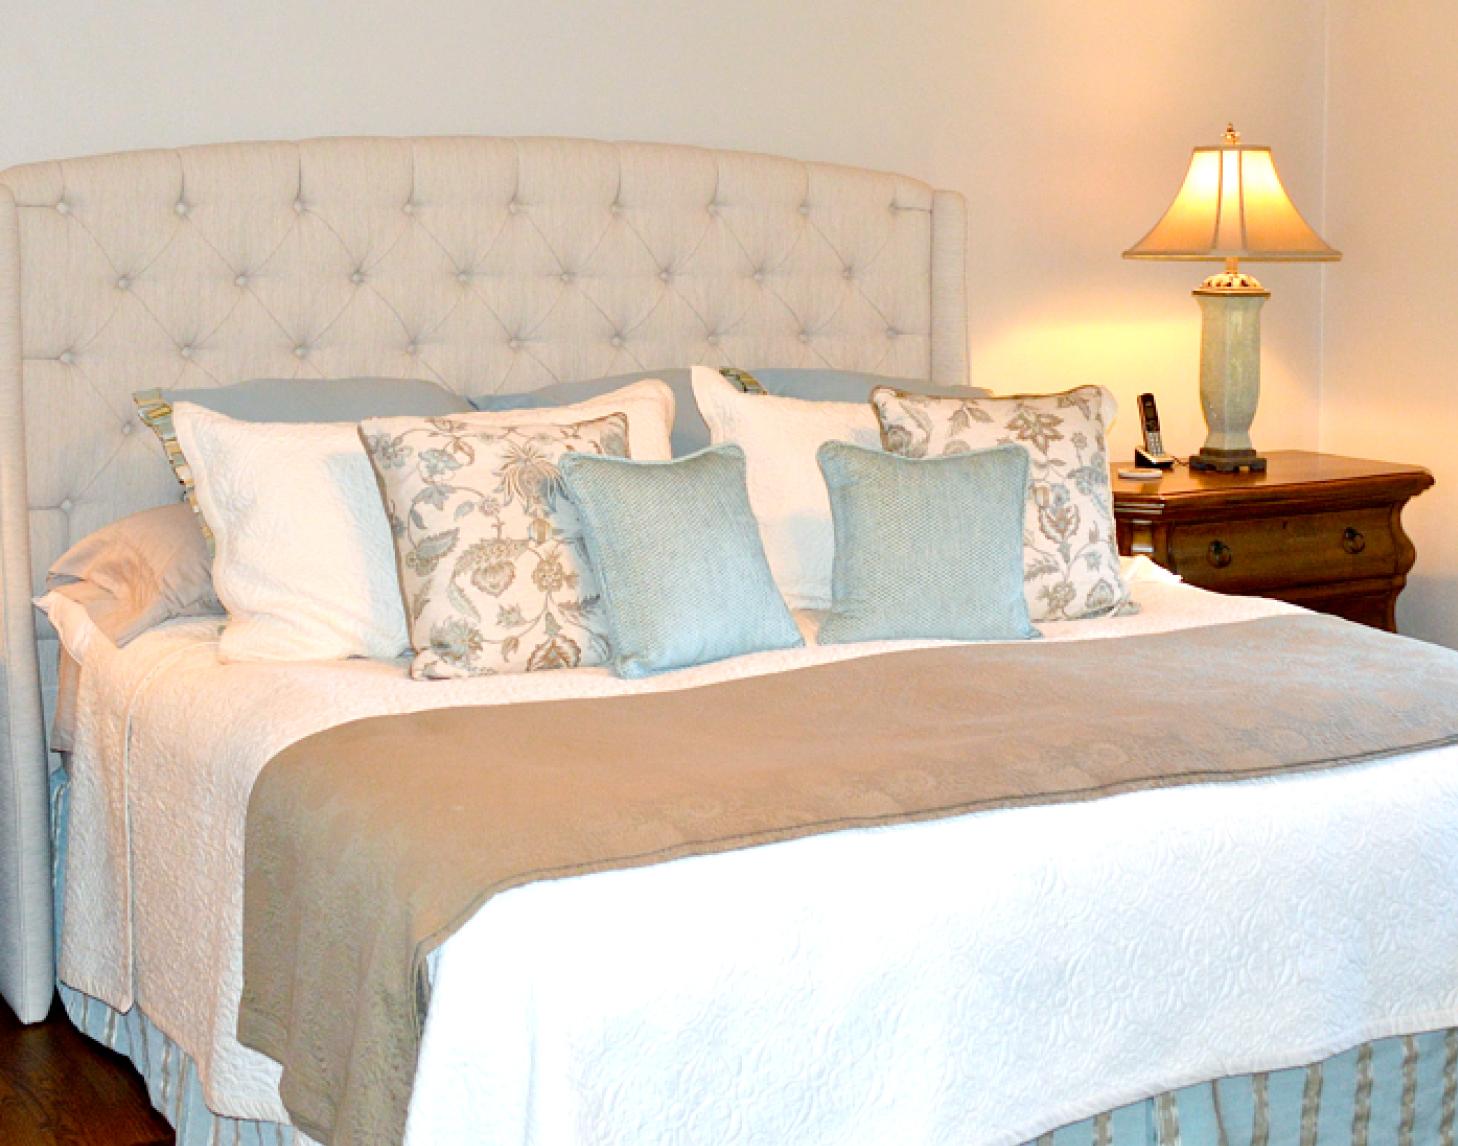 Custom Bedding by Lake Interiors | © Lake Interiors Inc.